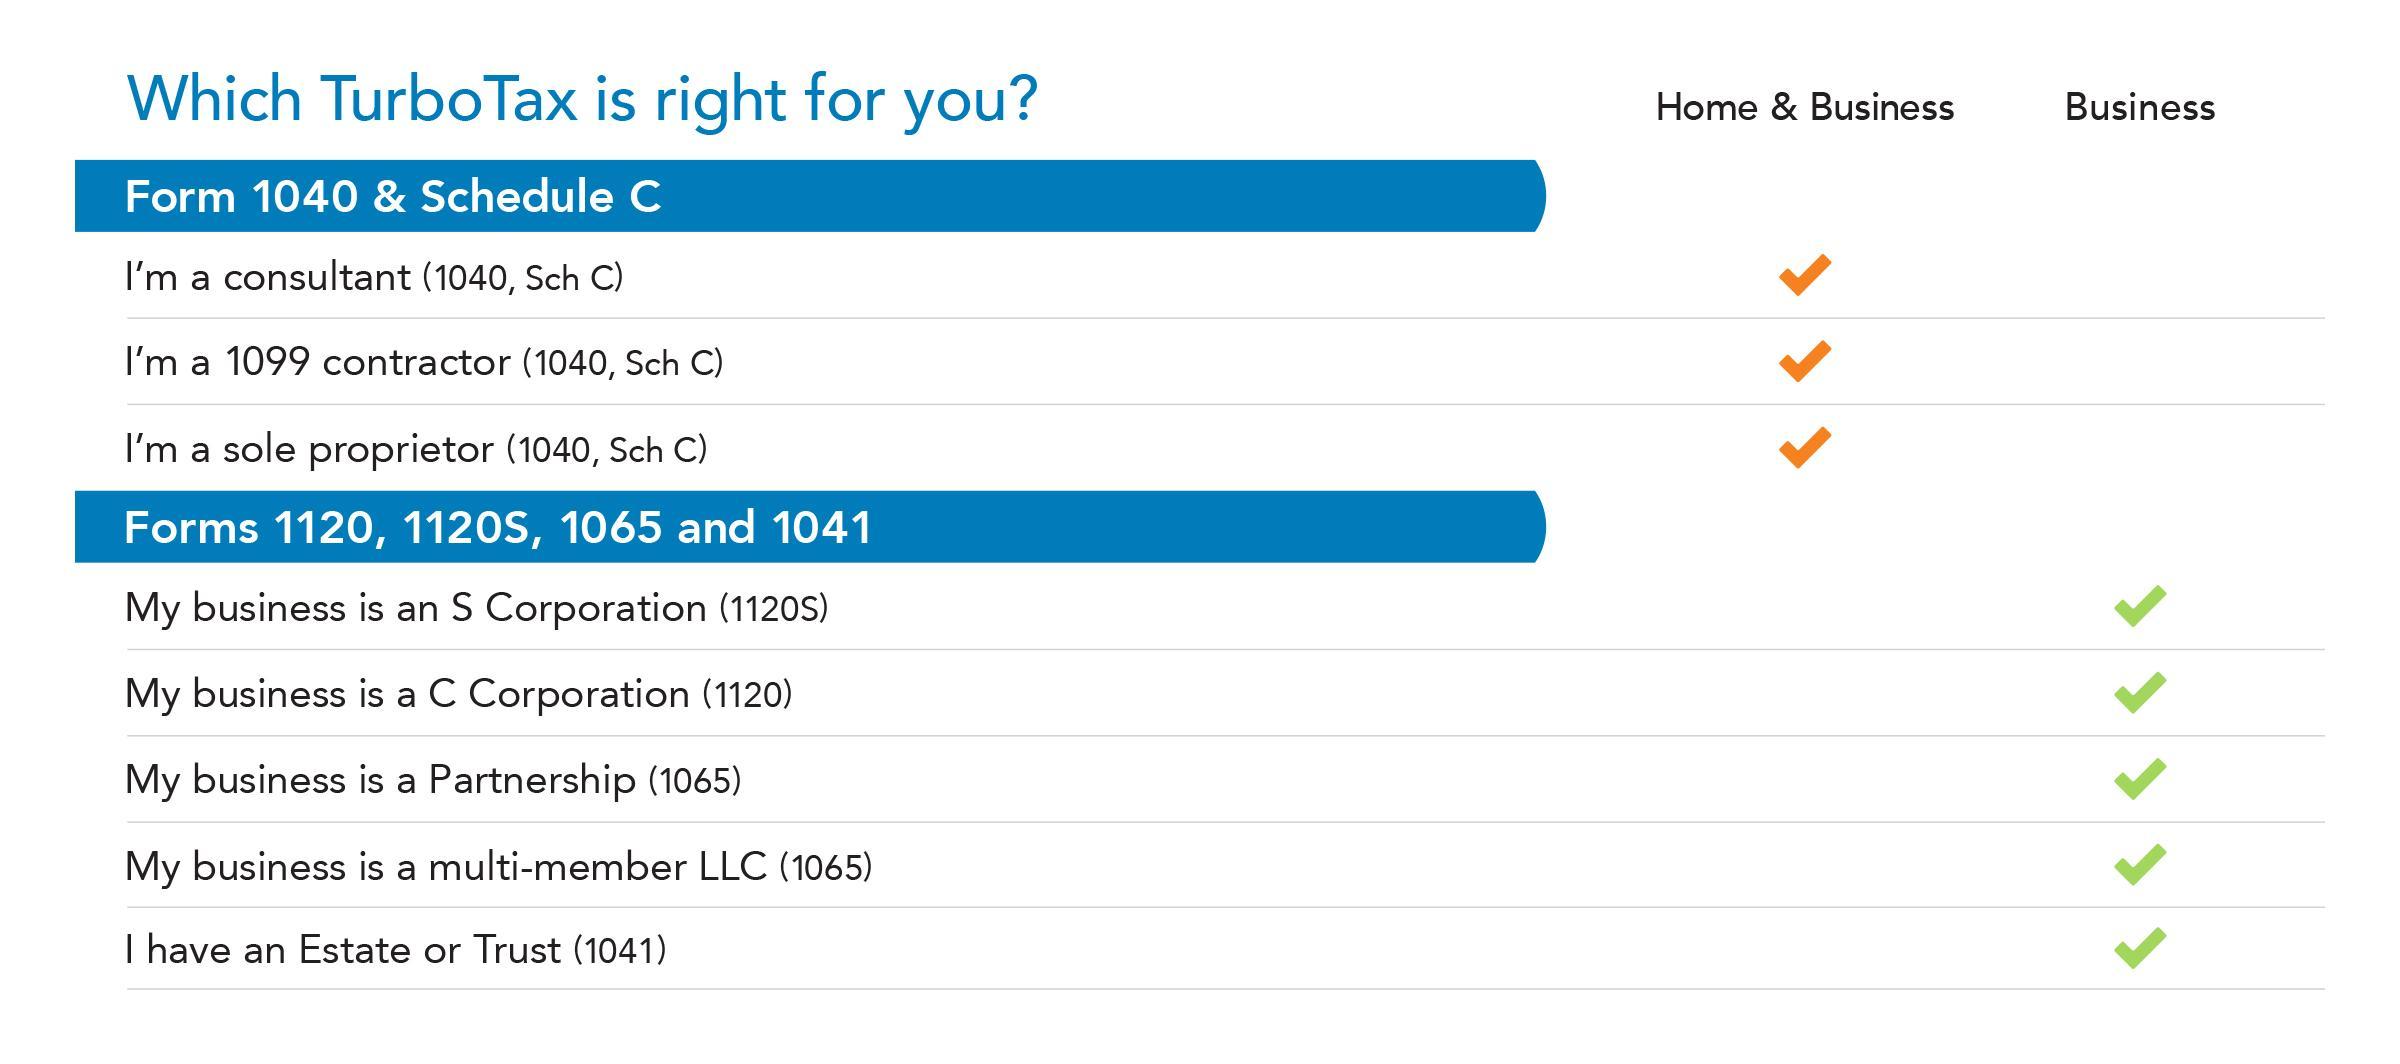 Amazon turbotax business 2015 federal fed efile tax turbotax 2015 comparison chart falaconquin